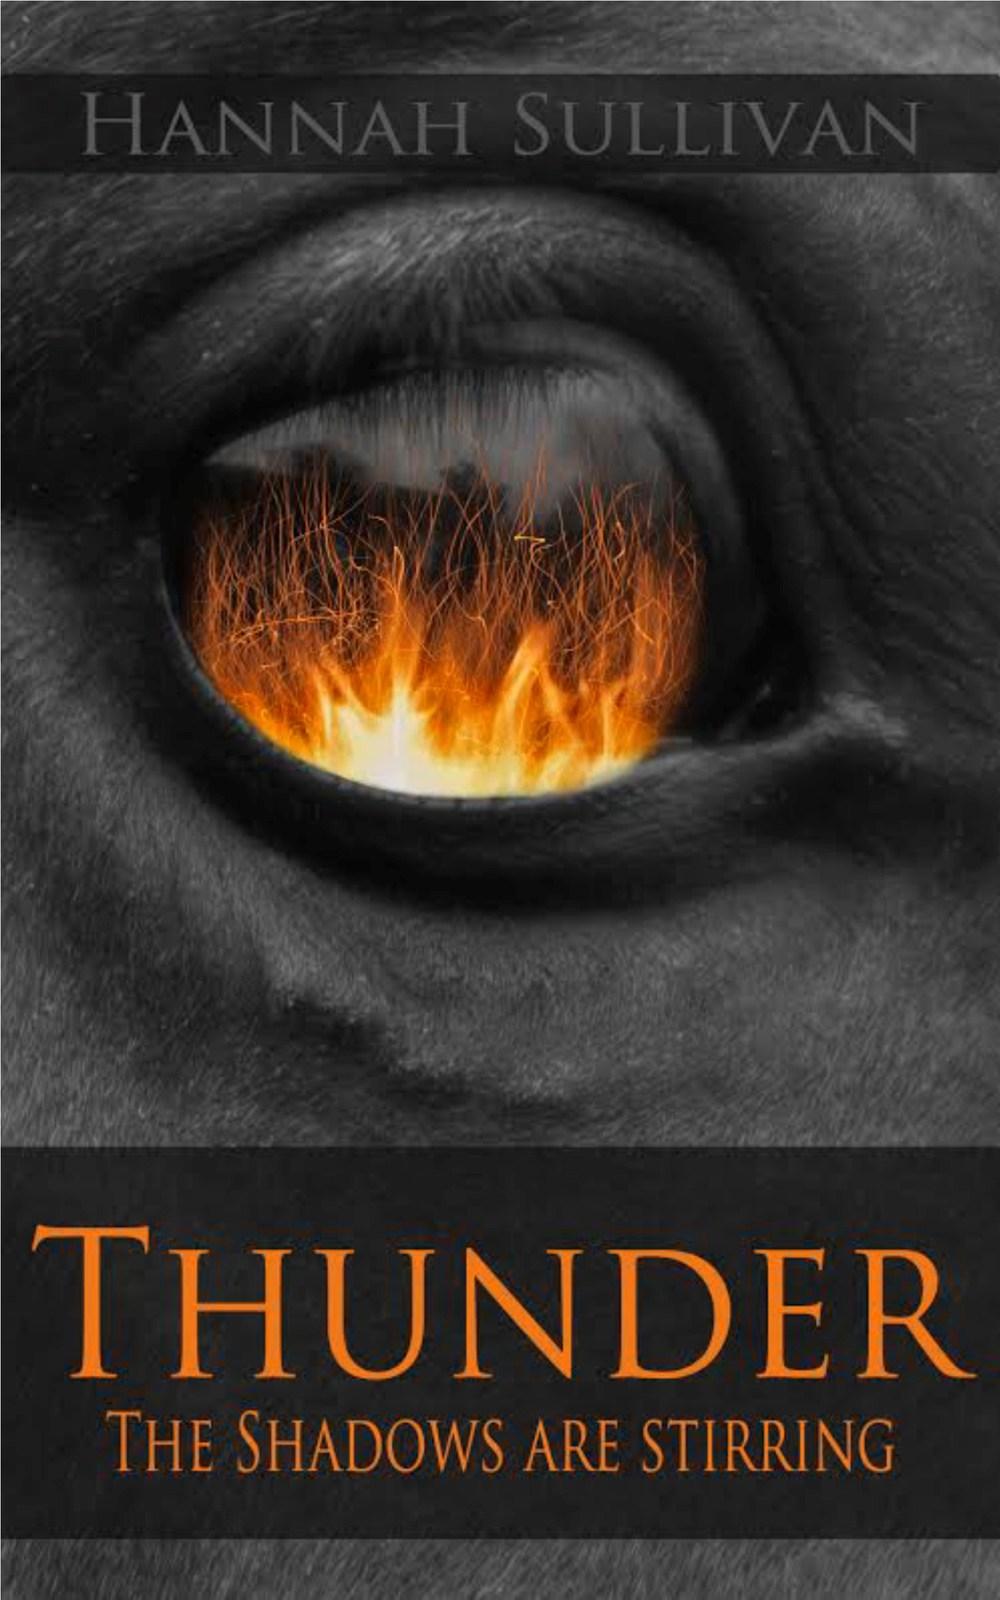 final Thunder1a.jpg